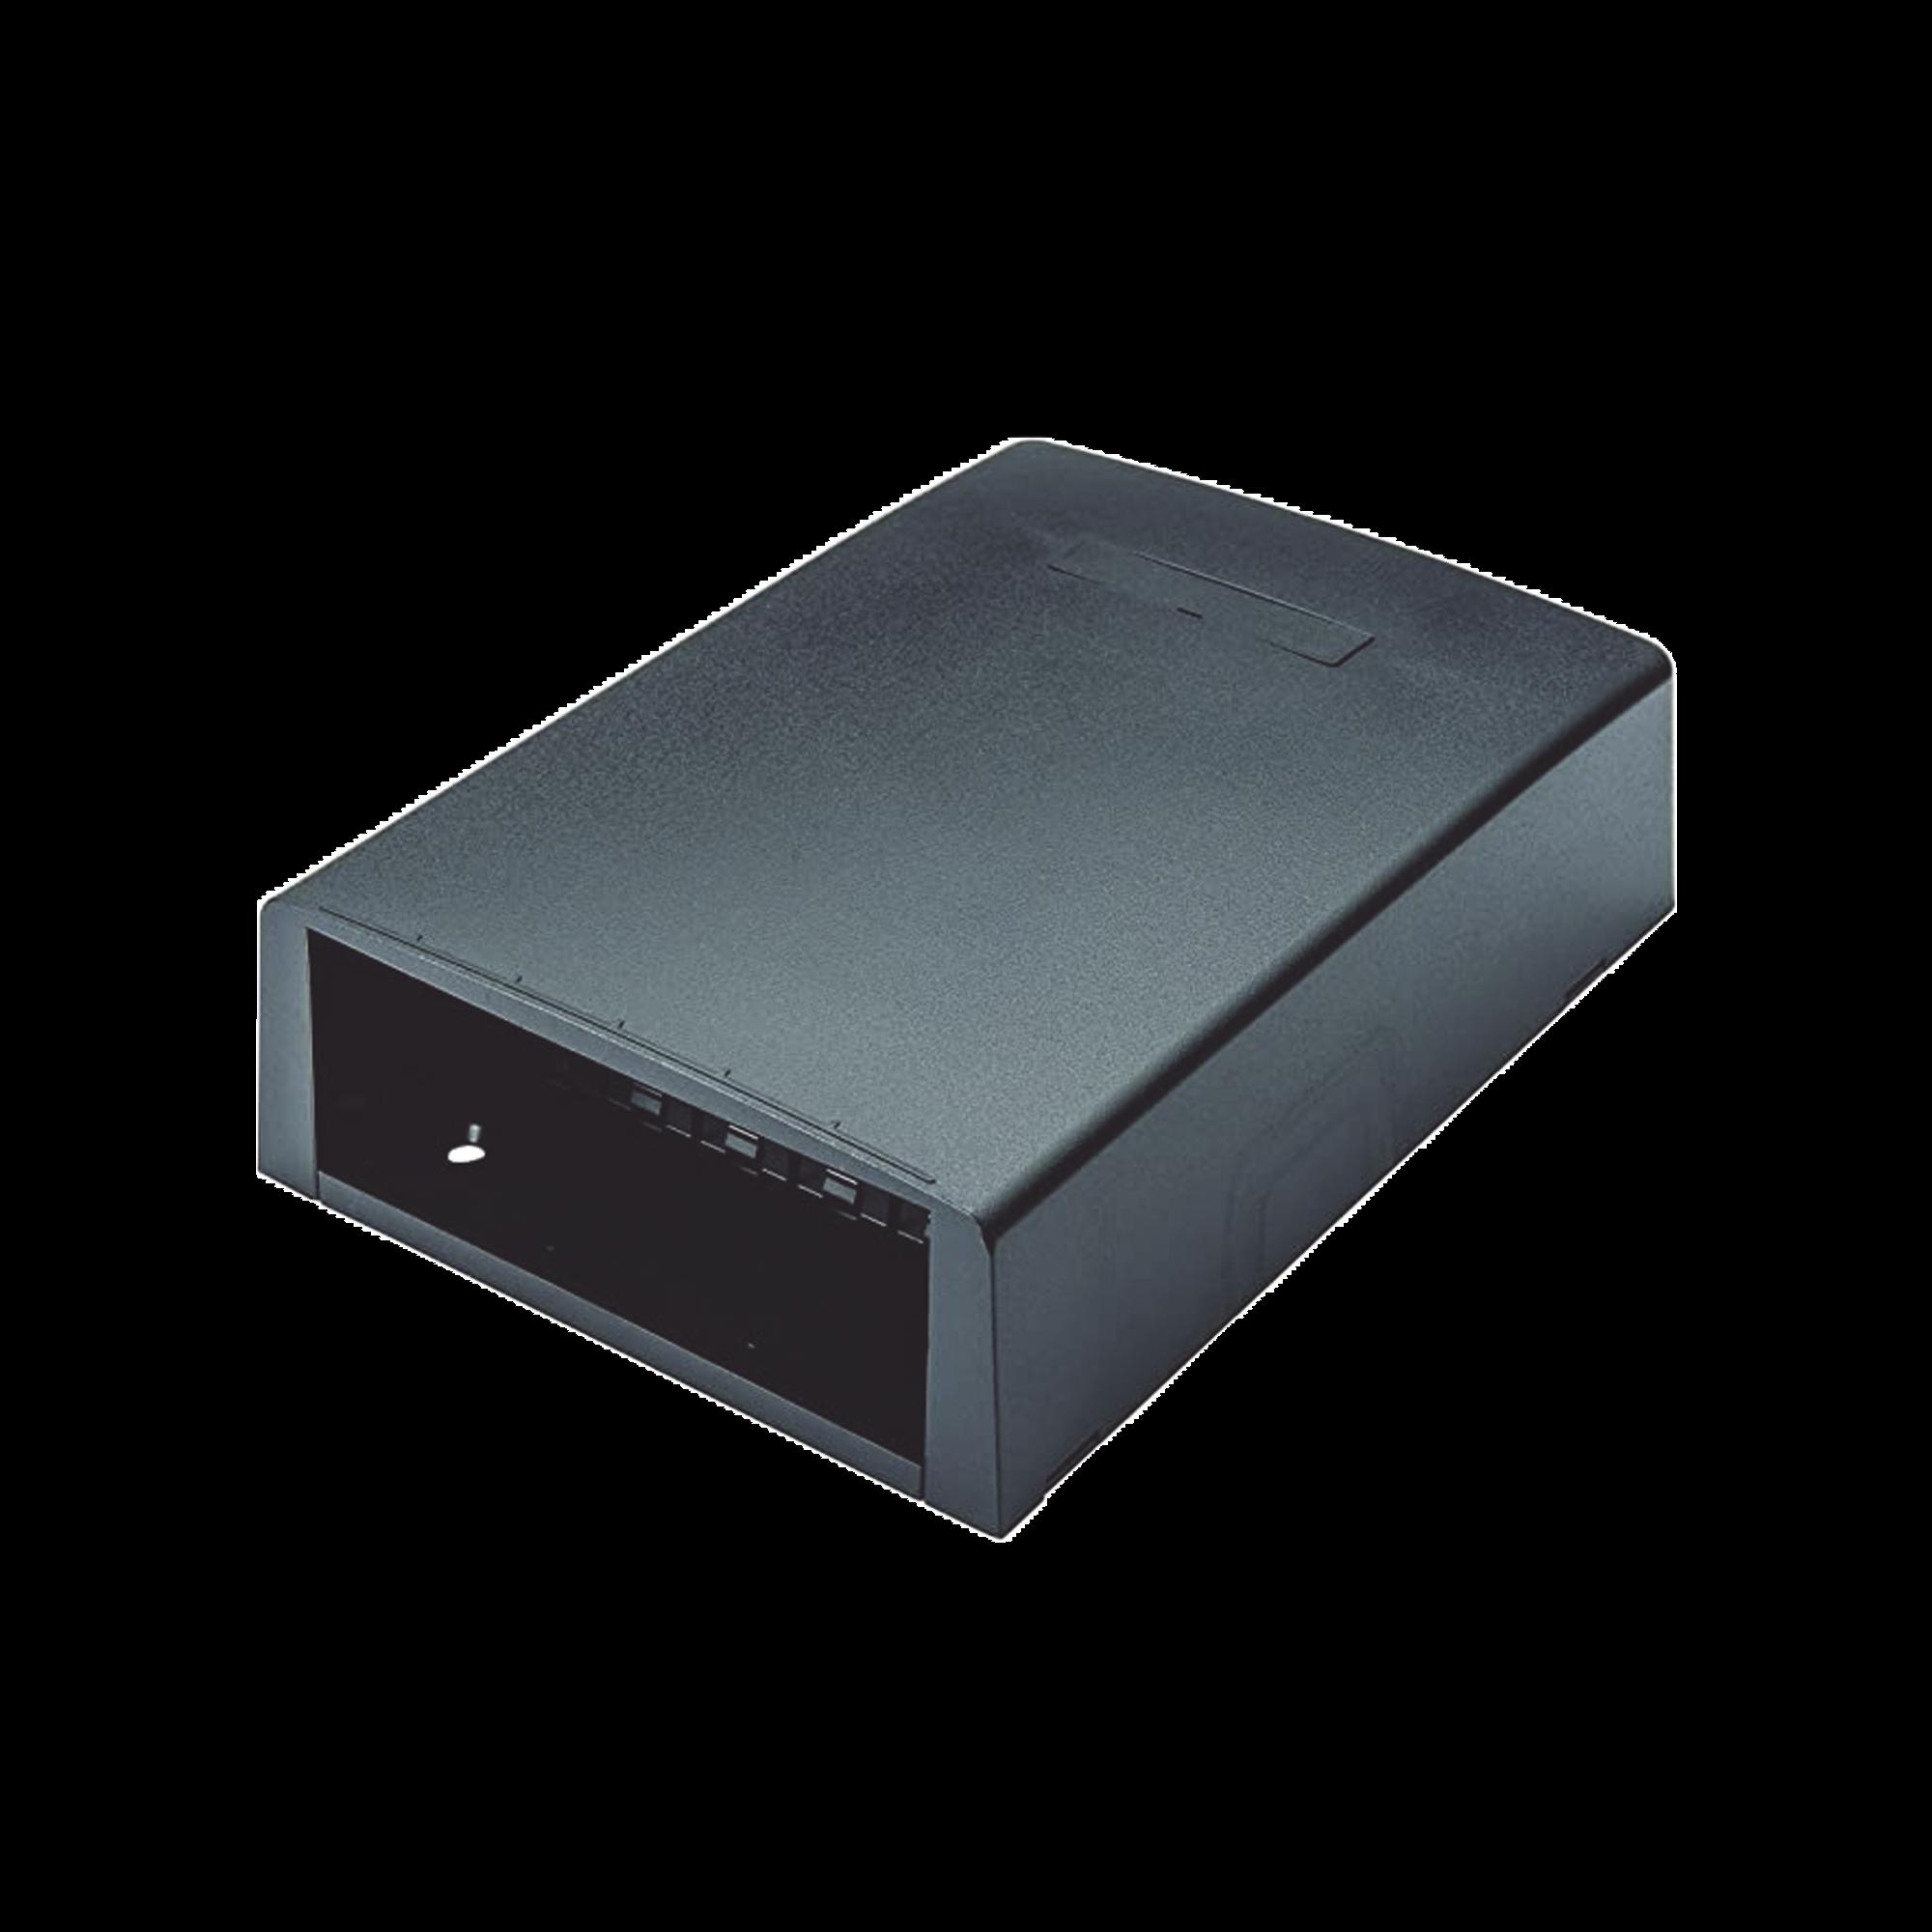 Caja de Montaje en Superficie, Con Accesorio para Resguardo de Fibra optica, Para 12 Modulos Mini-Com, Color Negro